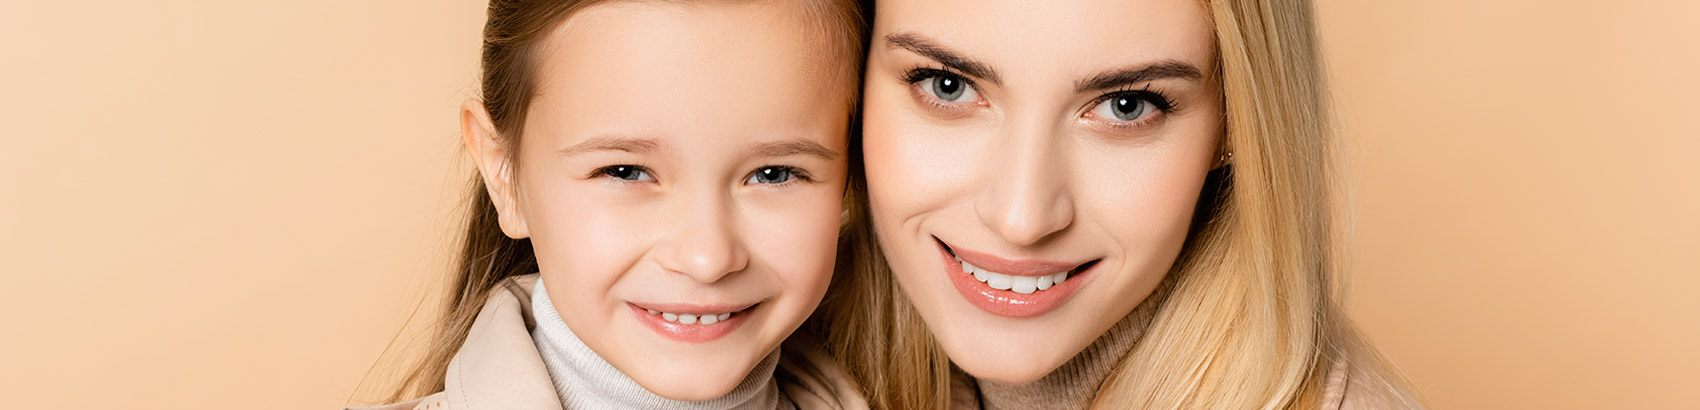 Dental Sealants - Asuncion Dental Group